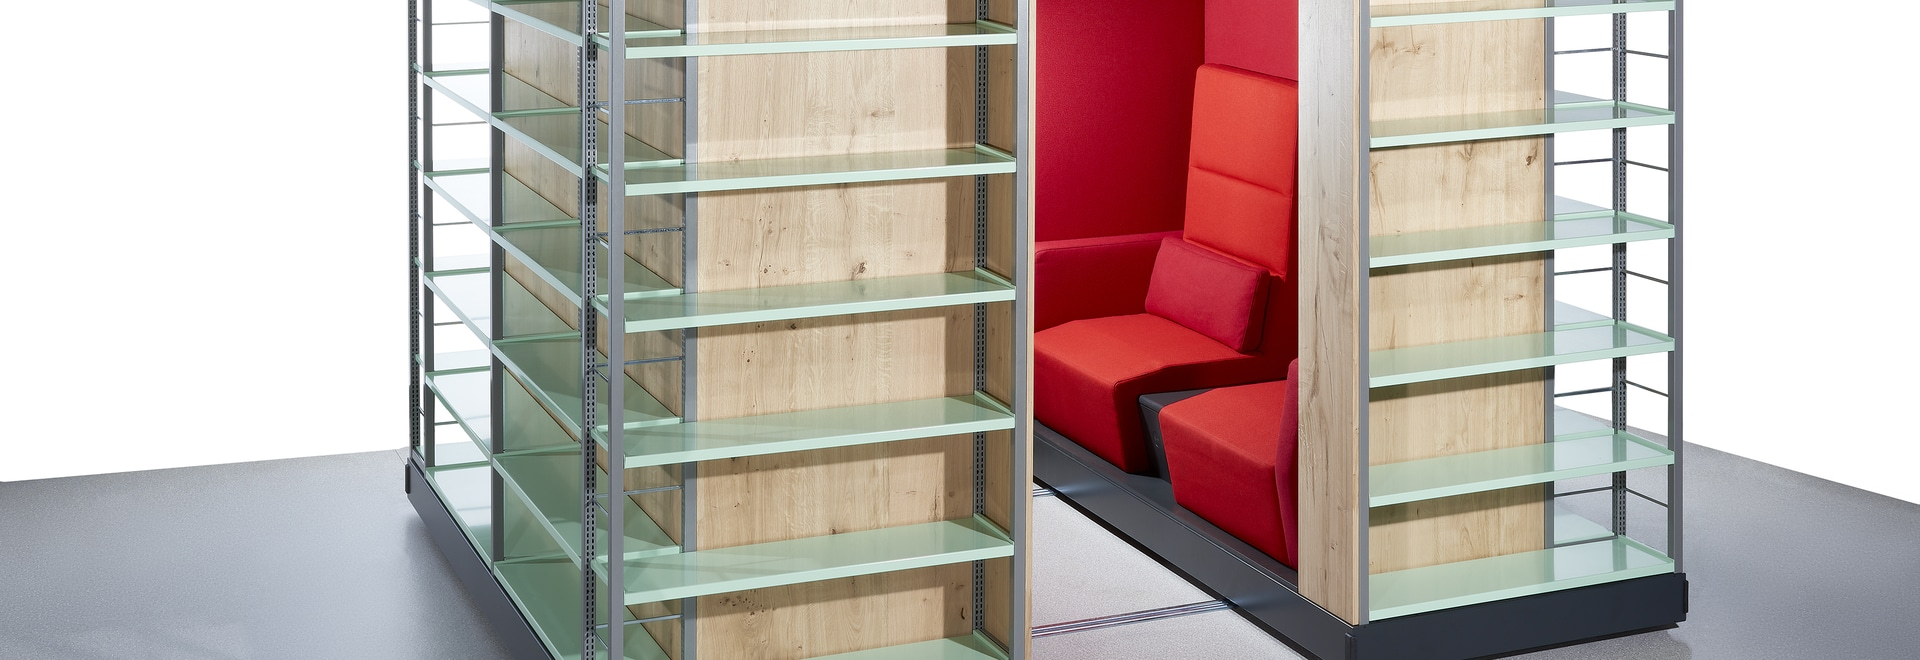 The new product Zambelli Pazio combines bookshelf and effective area.